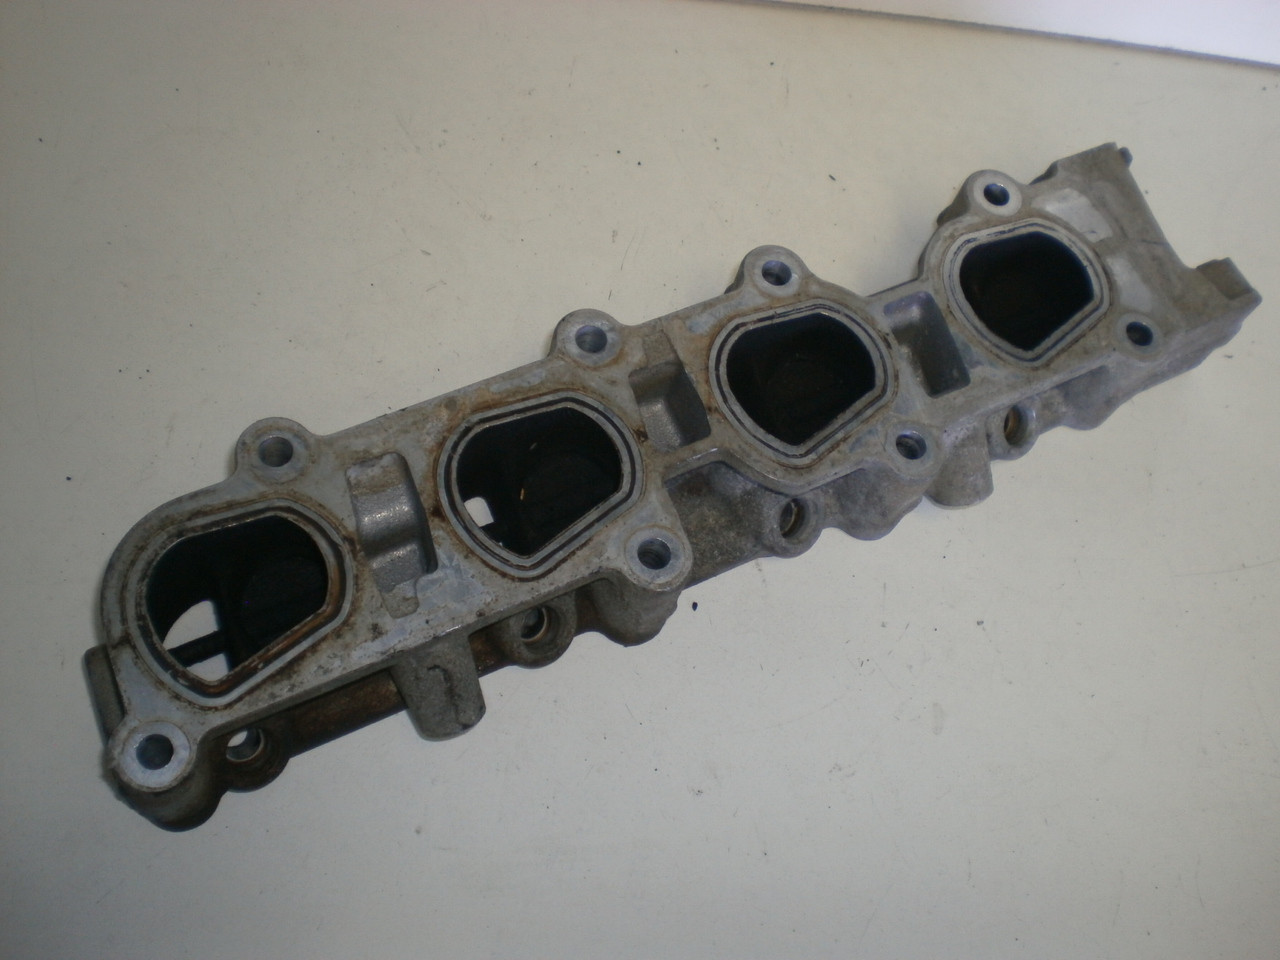 1997-2002 Ford Escort 2 0 2000 SOHC IMRC Intake Manifold Runner Control  Plate F7CE-8U524-AE